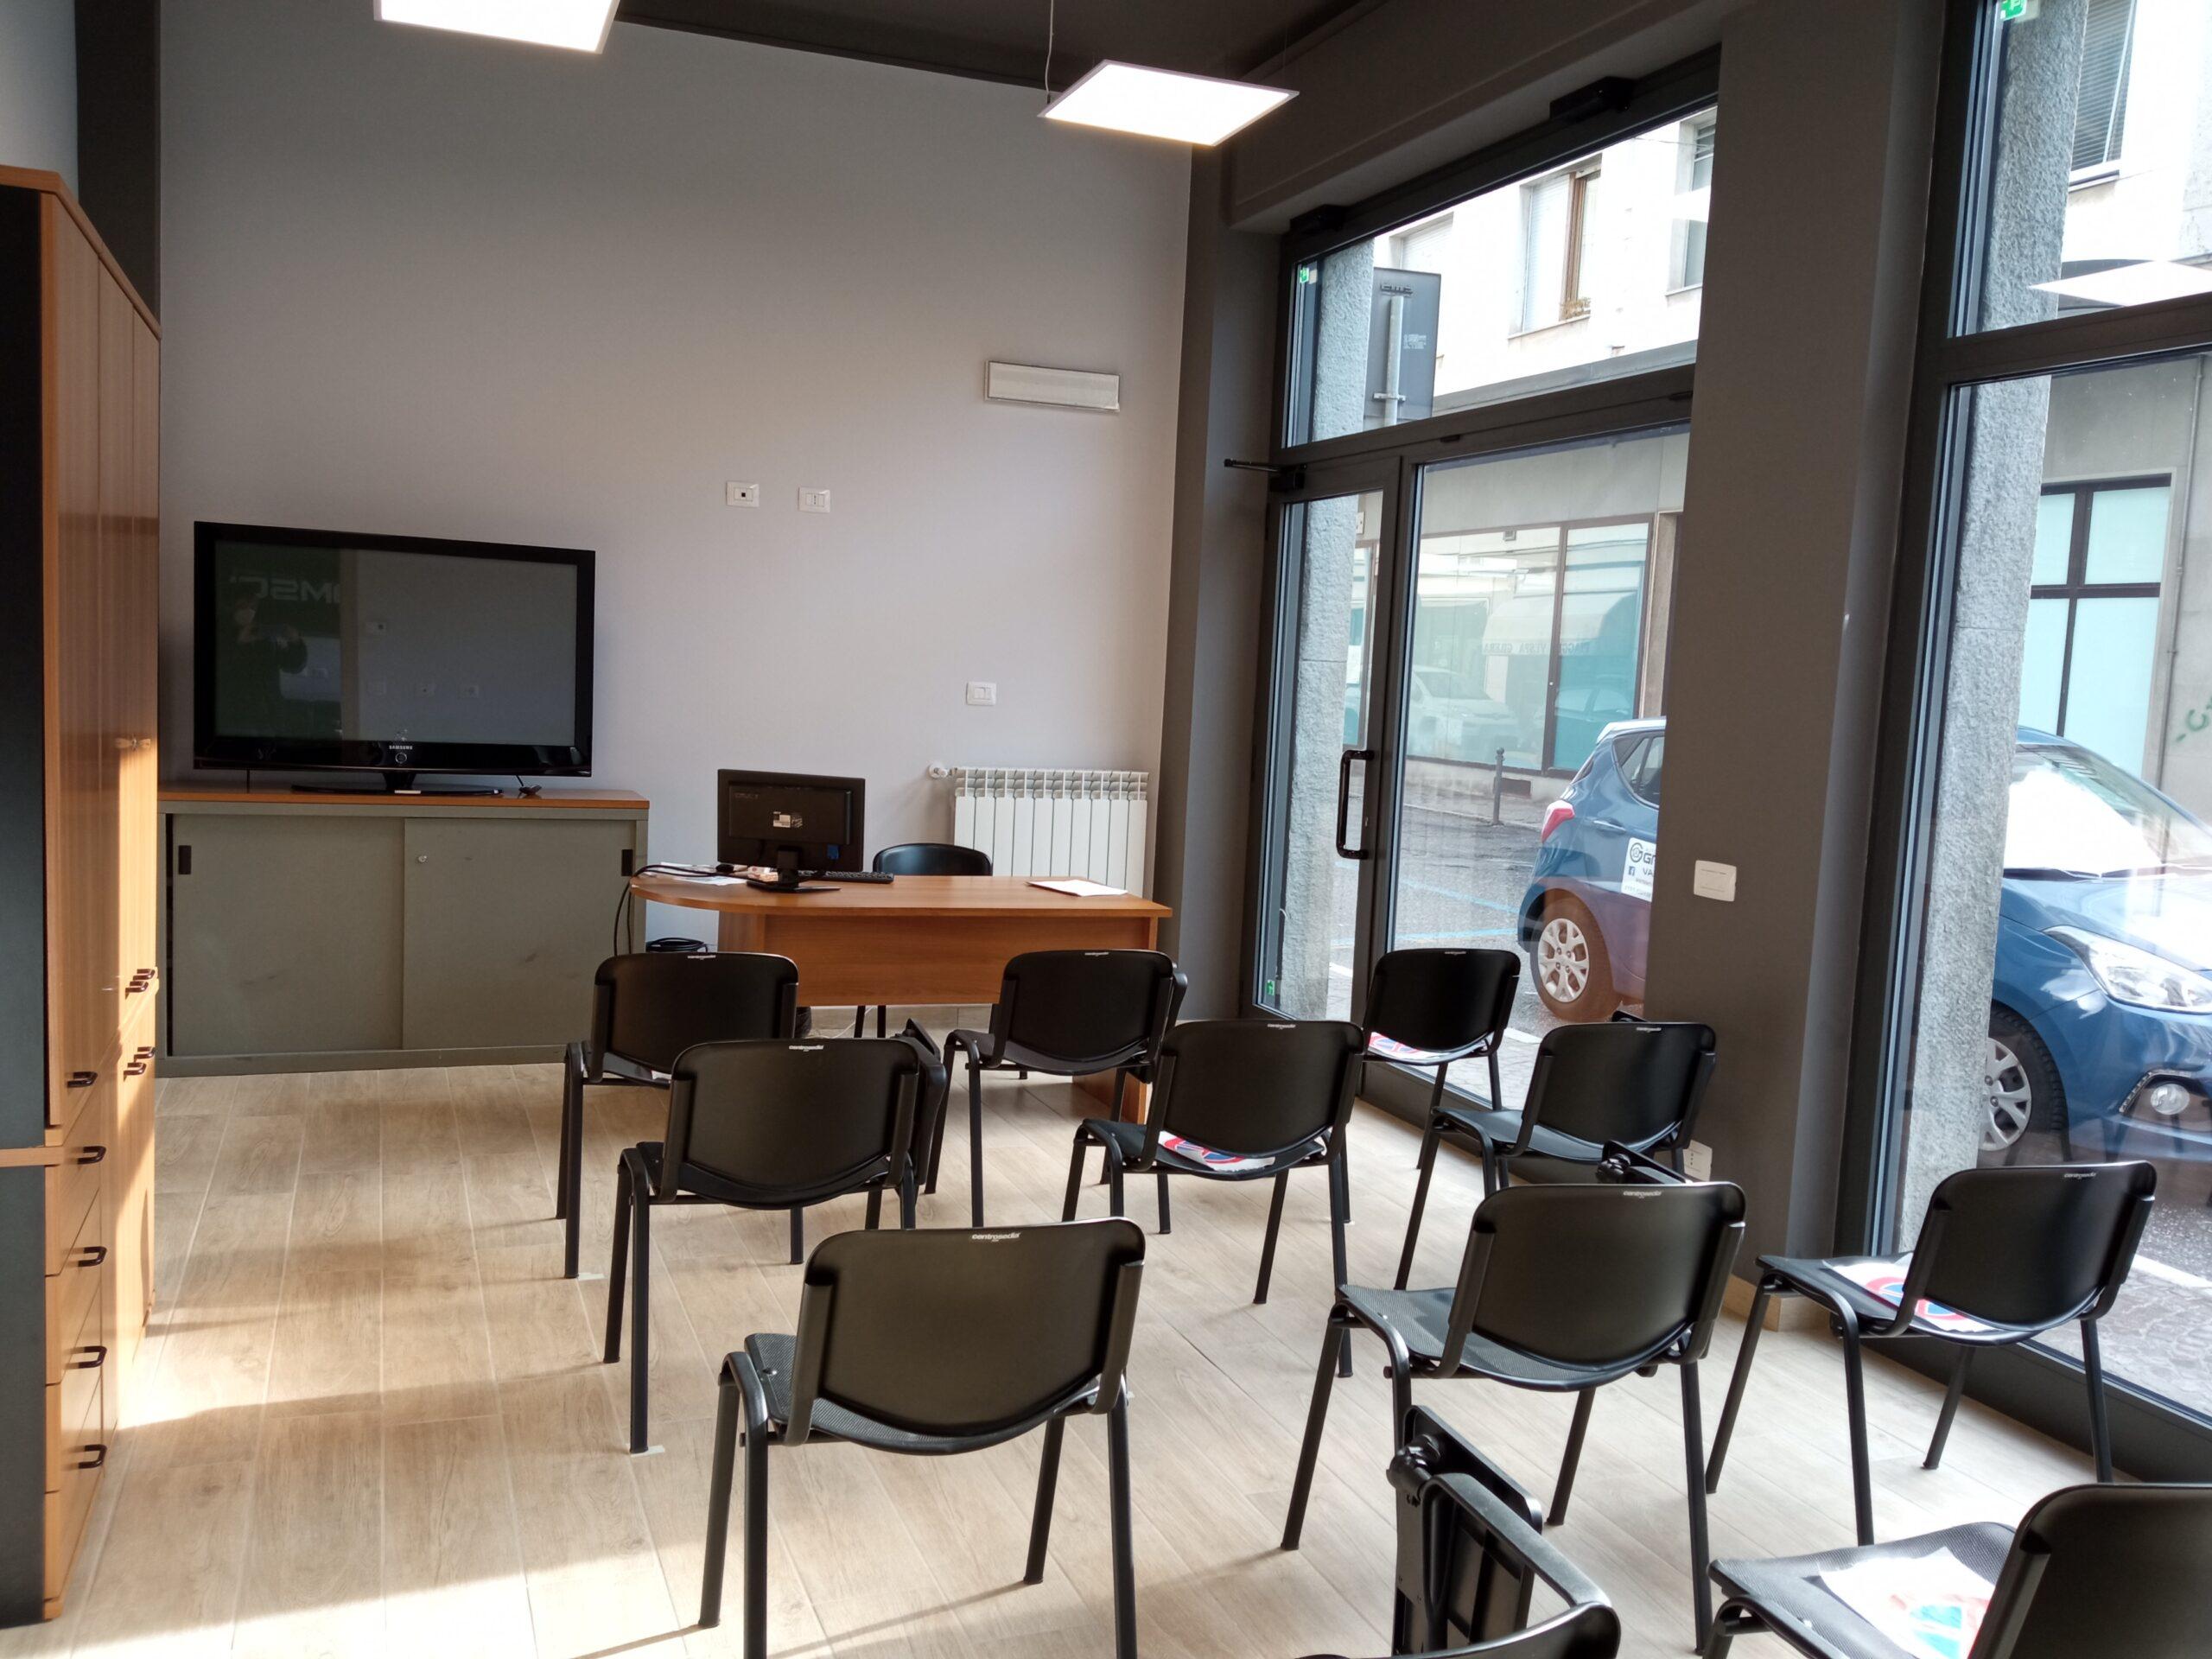 Autoscuola Gramsci - aula